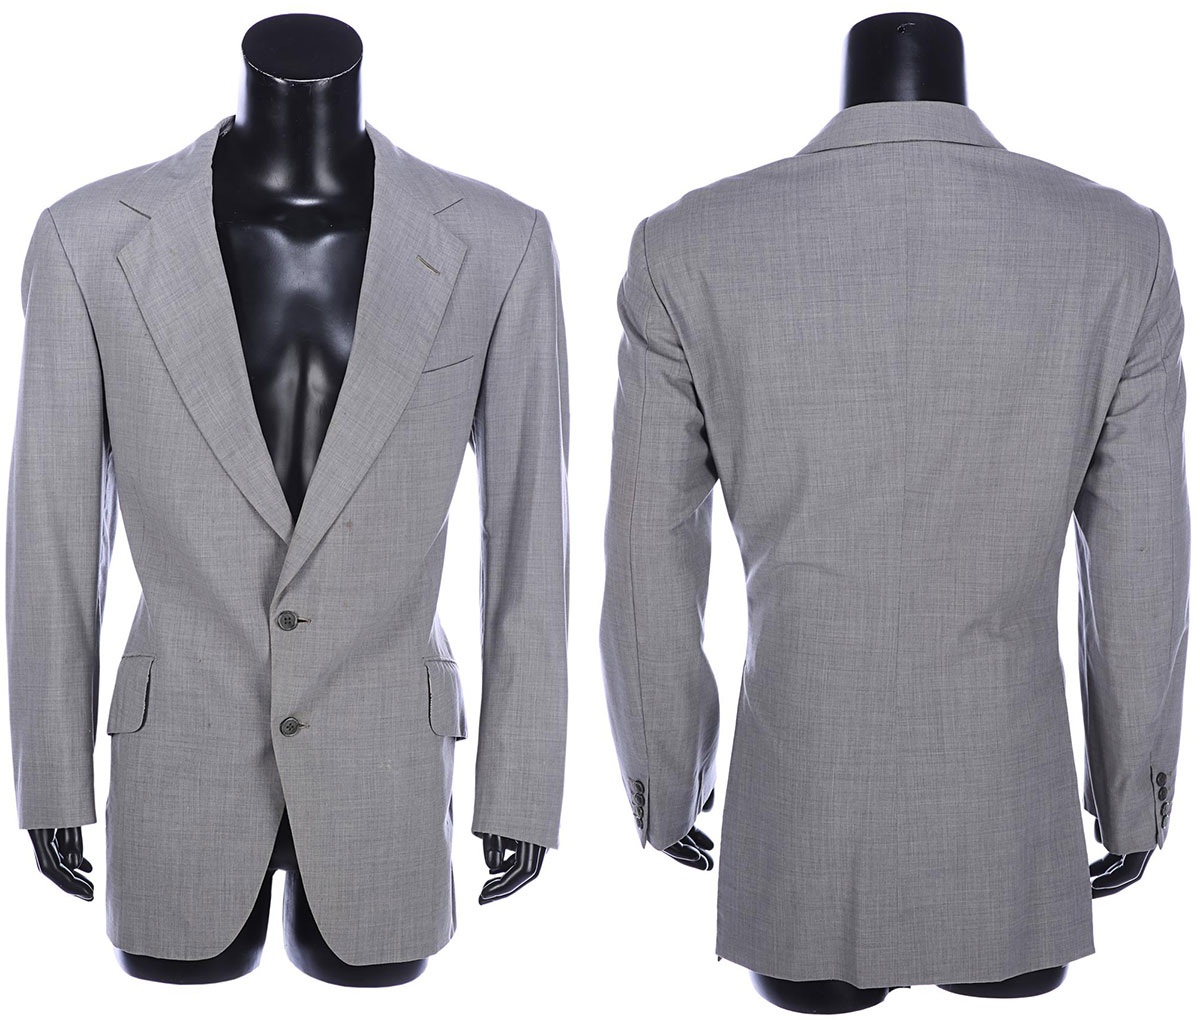 diamond are forever anthony sinclair suit james bond auction